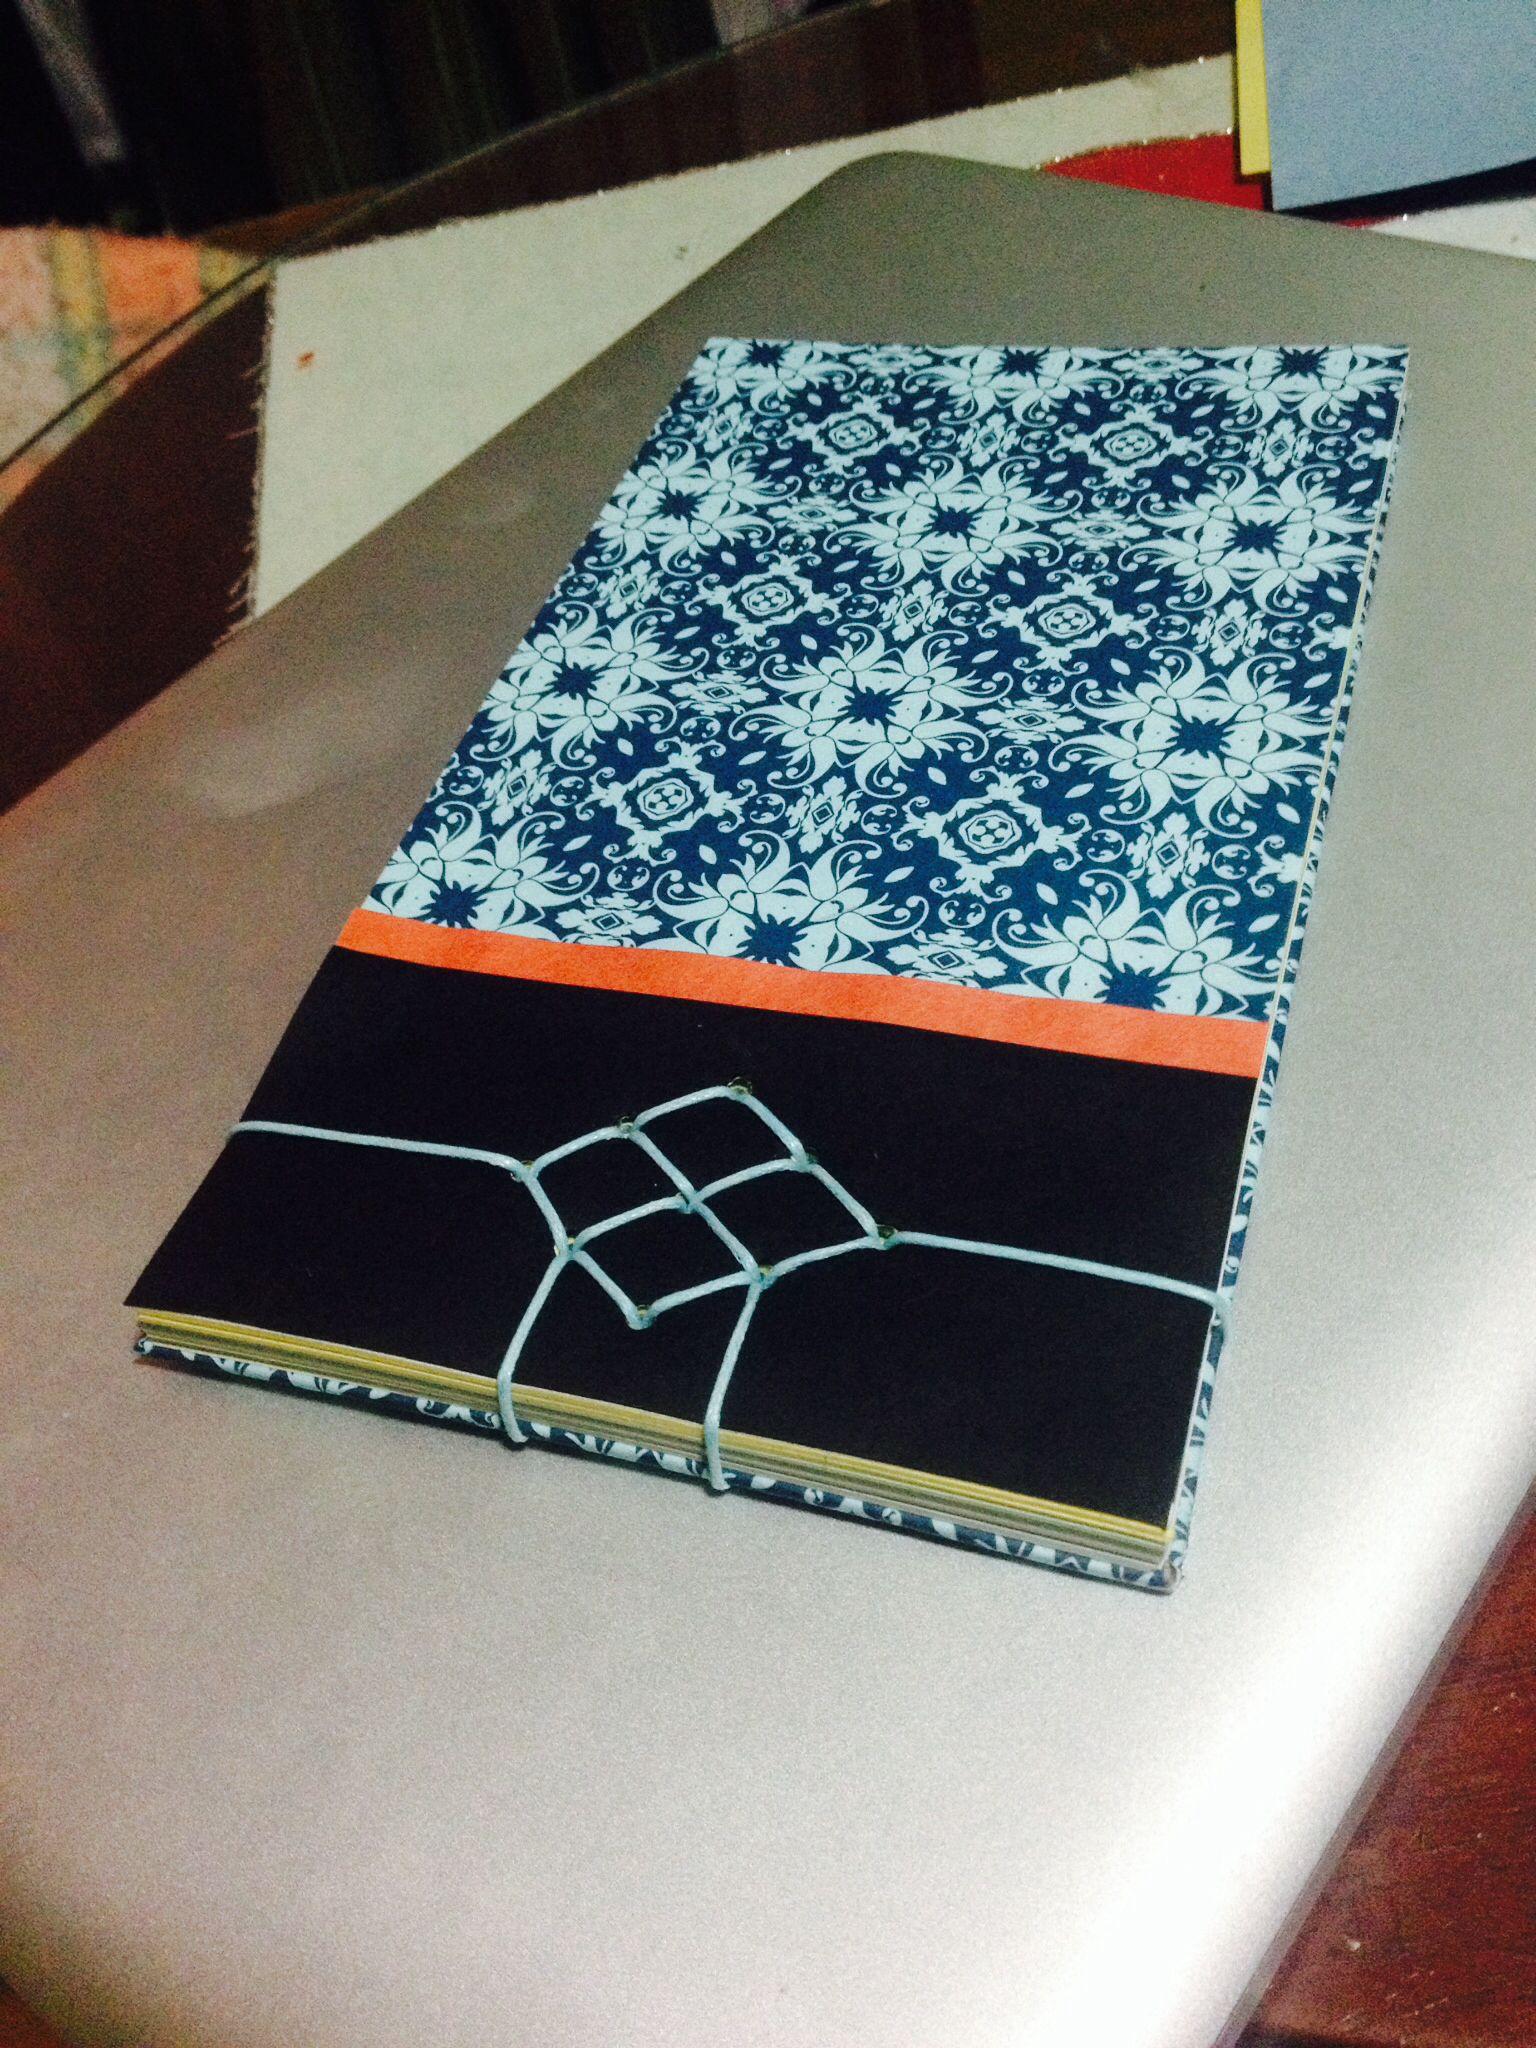 japanese binding book binding pinterest buch binden b cher und buch selber binden. Black Bedroom Furniture Sets. Home Design Ideas